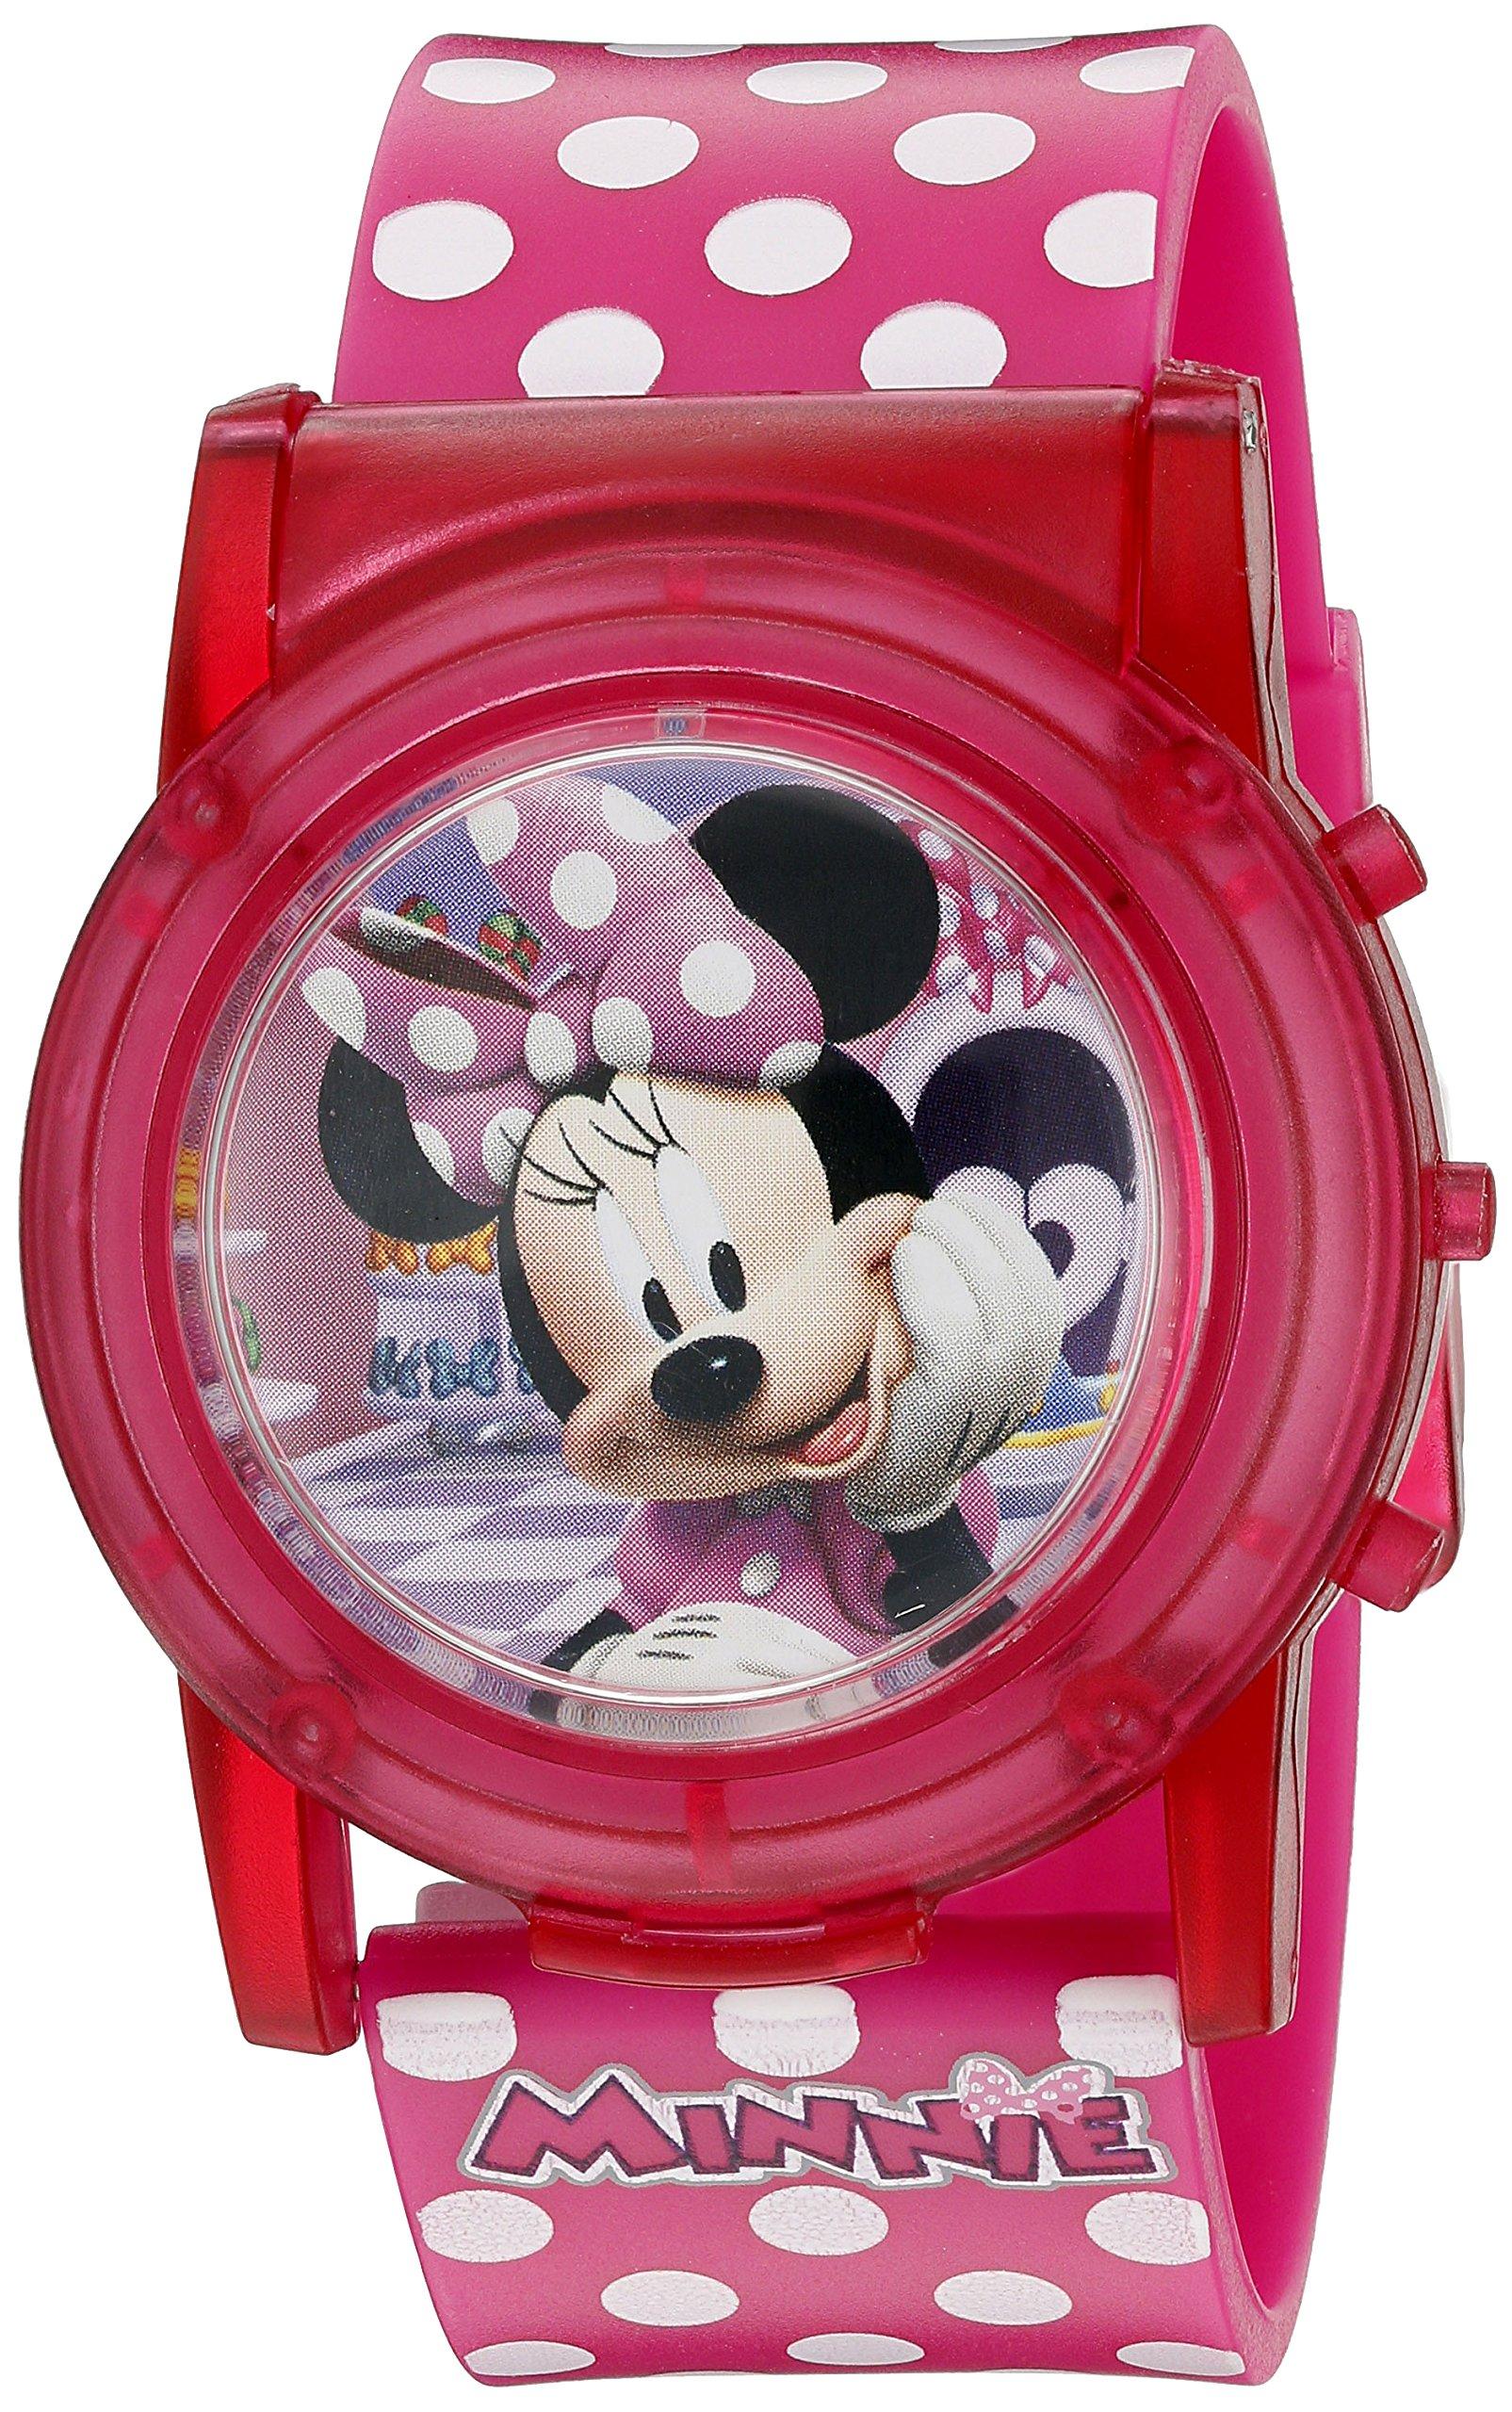 Minnie Mouse Boutique LCD Pop Musical Watch (Model: MBT3714SR)